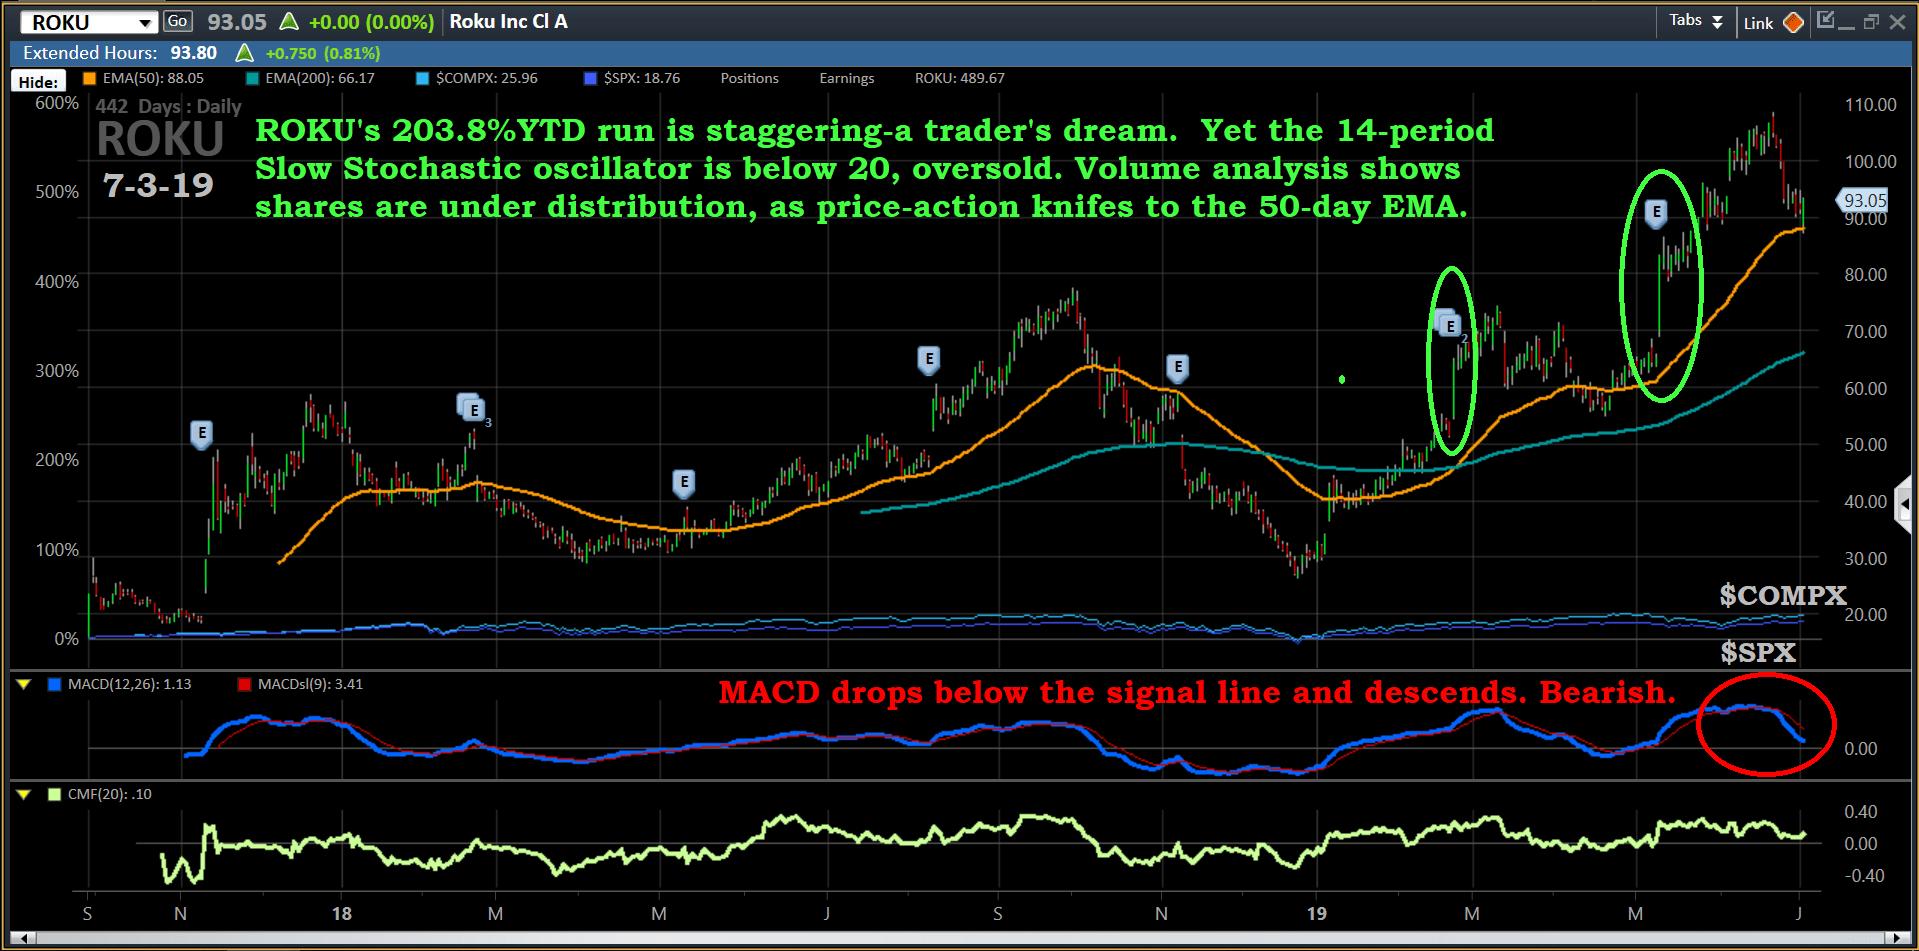 Chart, ROKU, 7-3-19